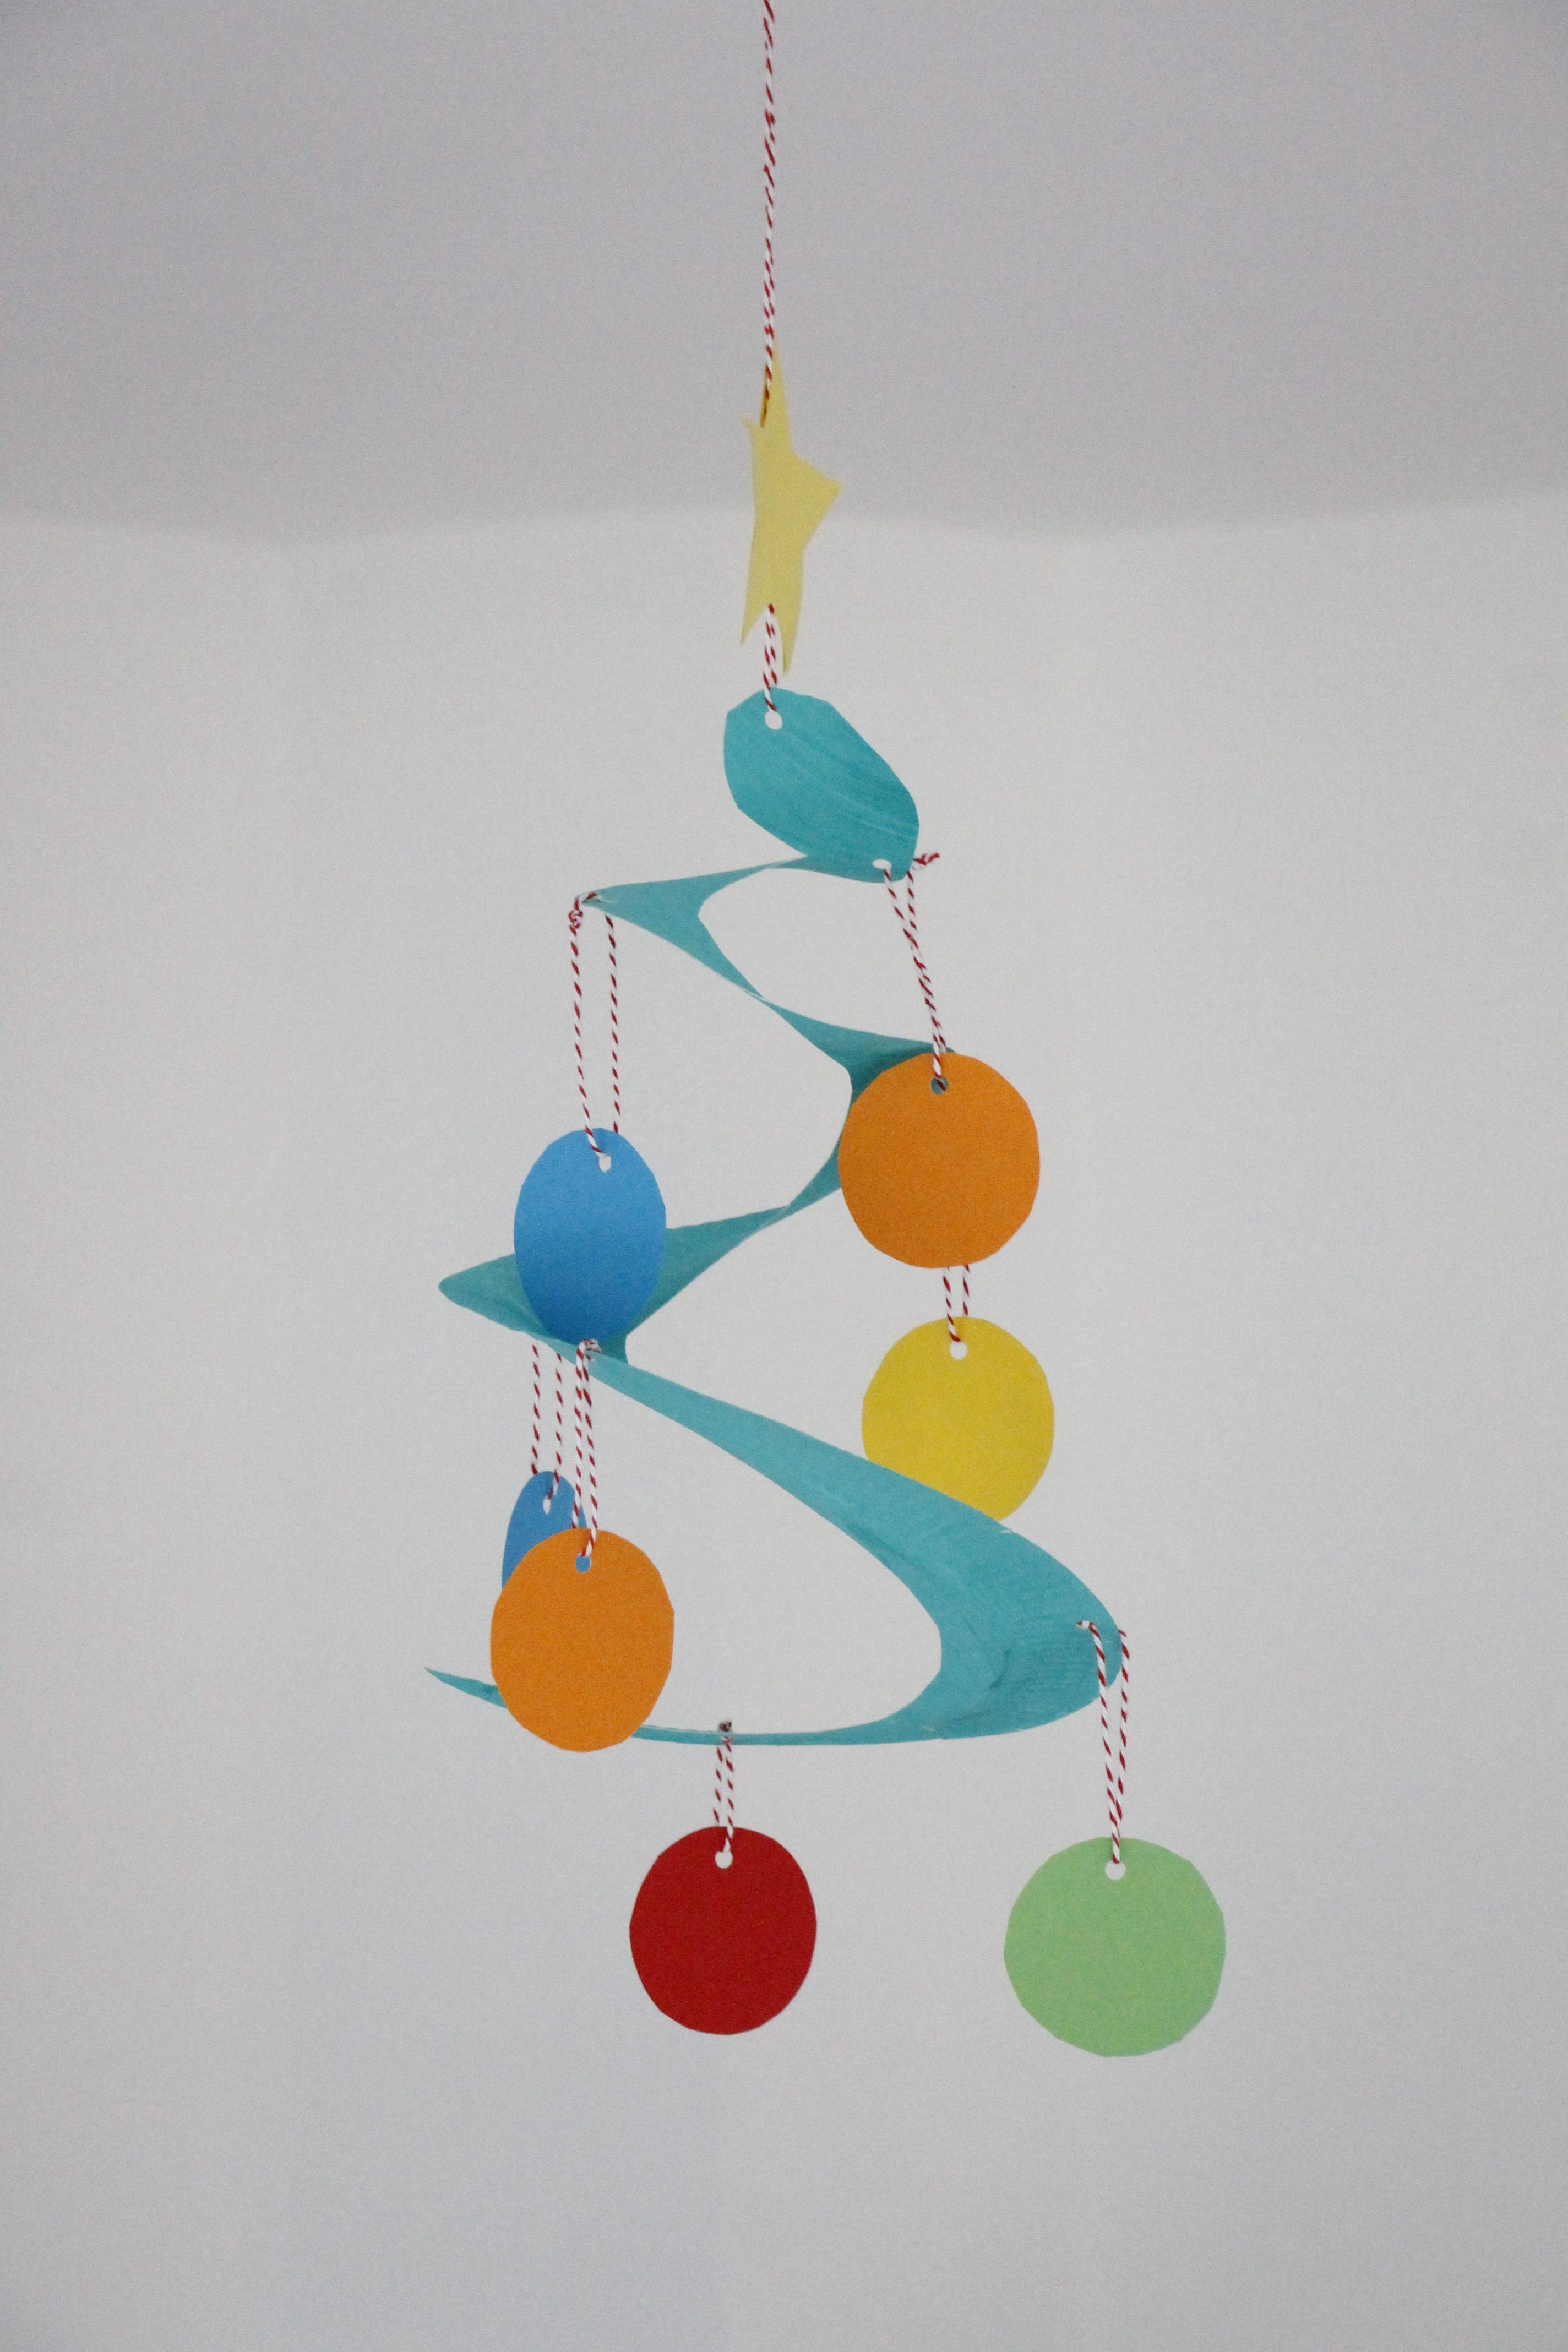 weihnachtsgeschenk selber basteln mit kindern lavendelblog. Black Bedroom Furniture Sets. Home Design Ideas